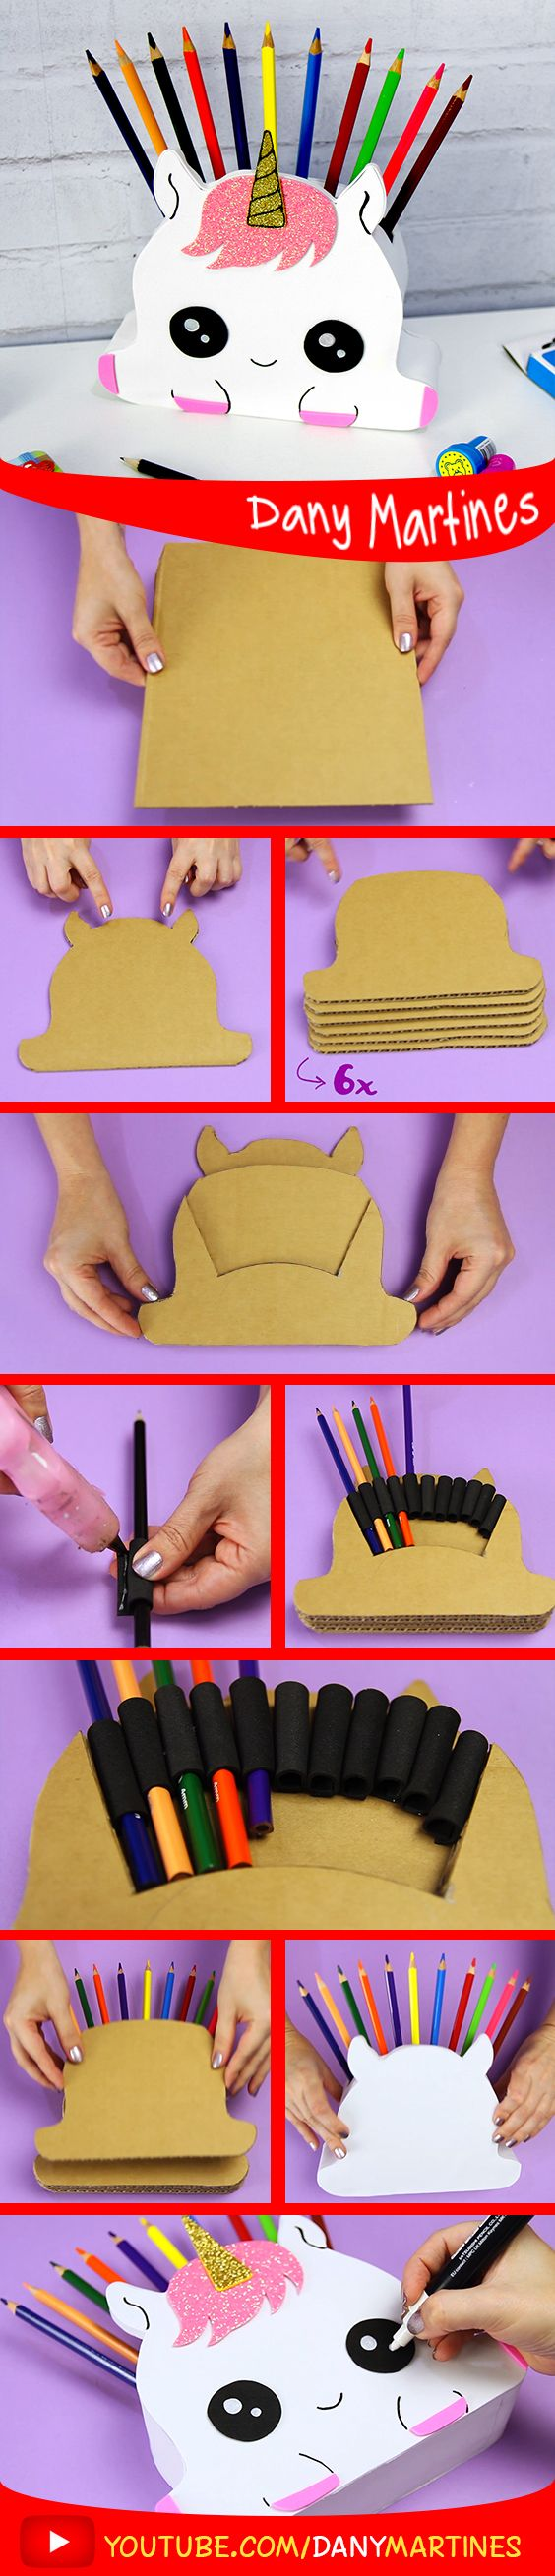 Faça você mesmo unicornio porta lapis super fofo cute kawaii, diy , do it yourself, Dany Martines unicorn